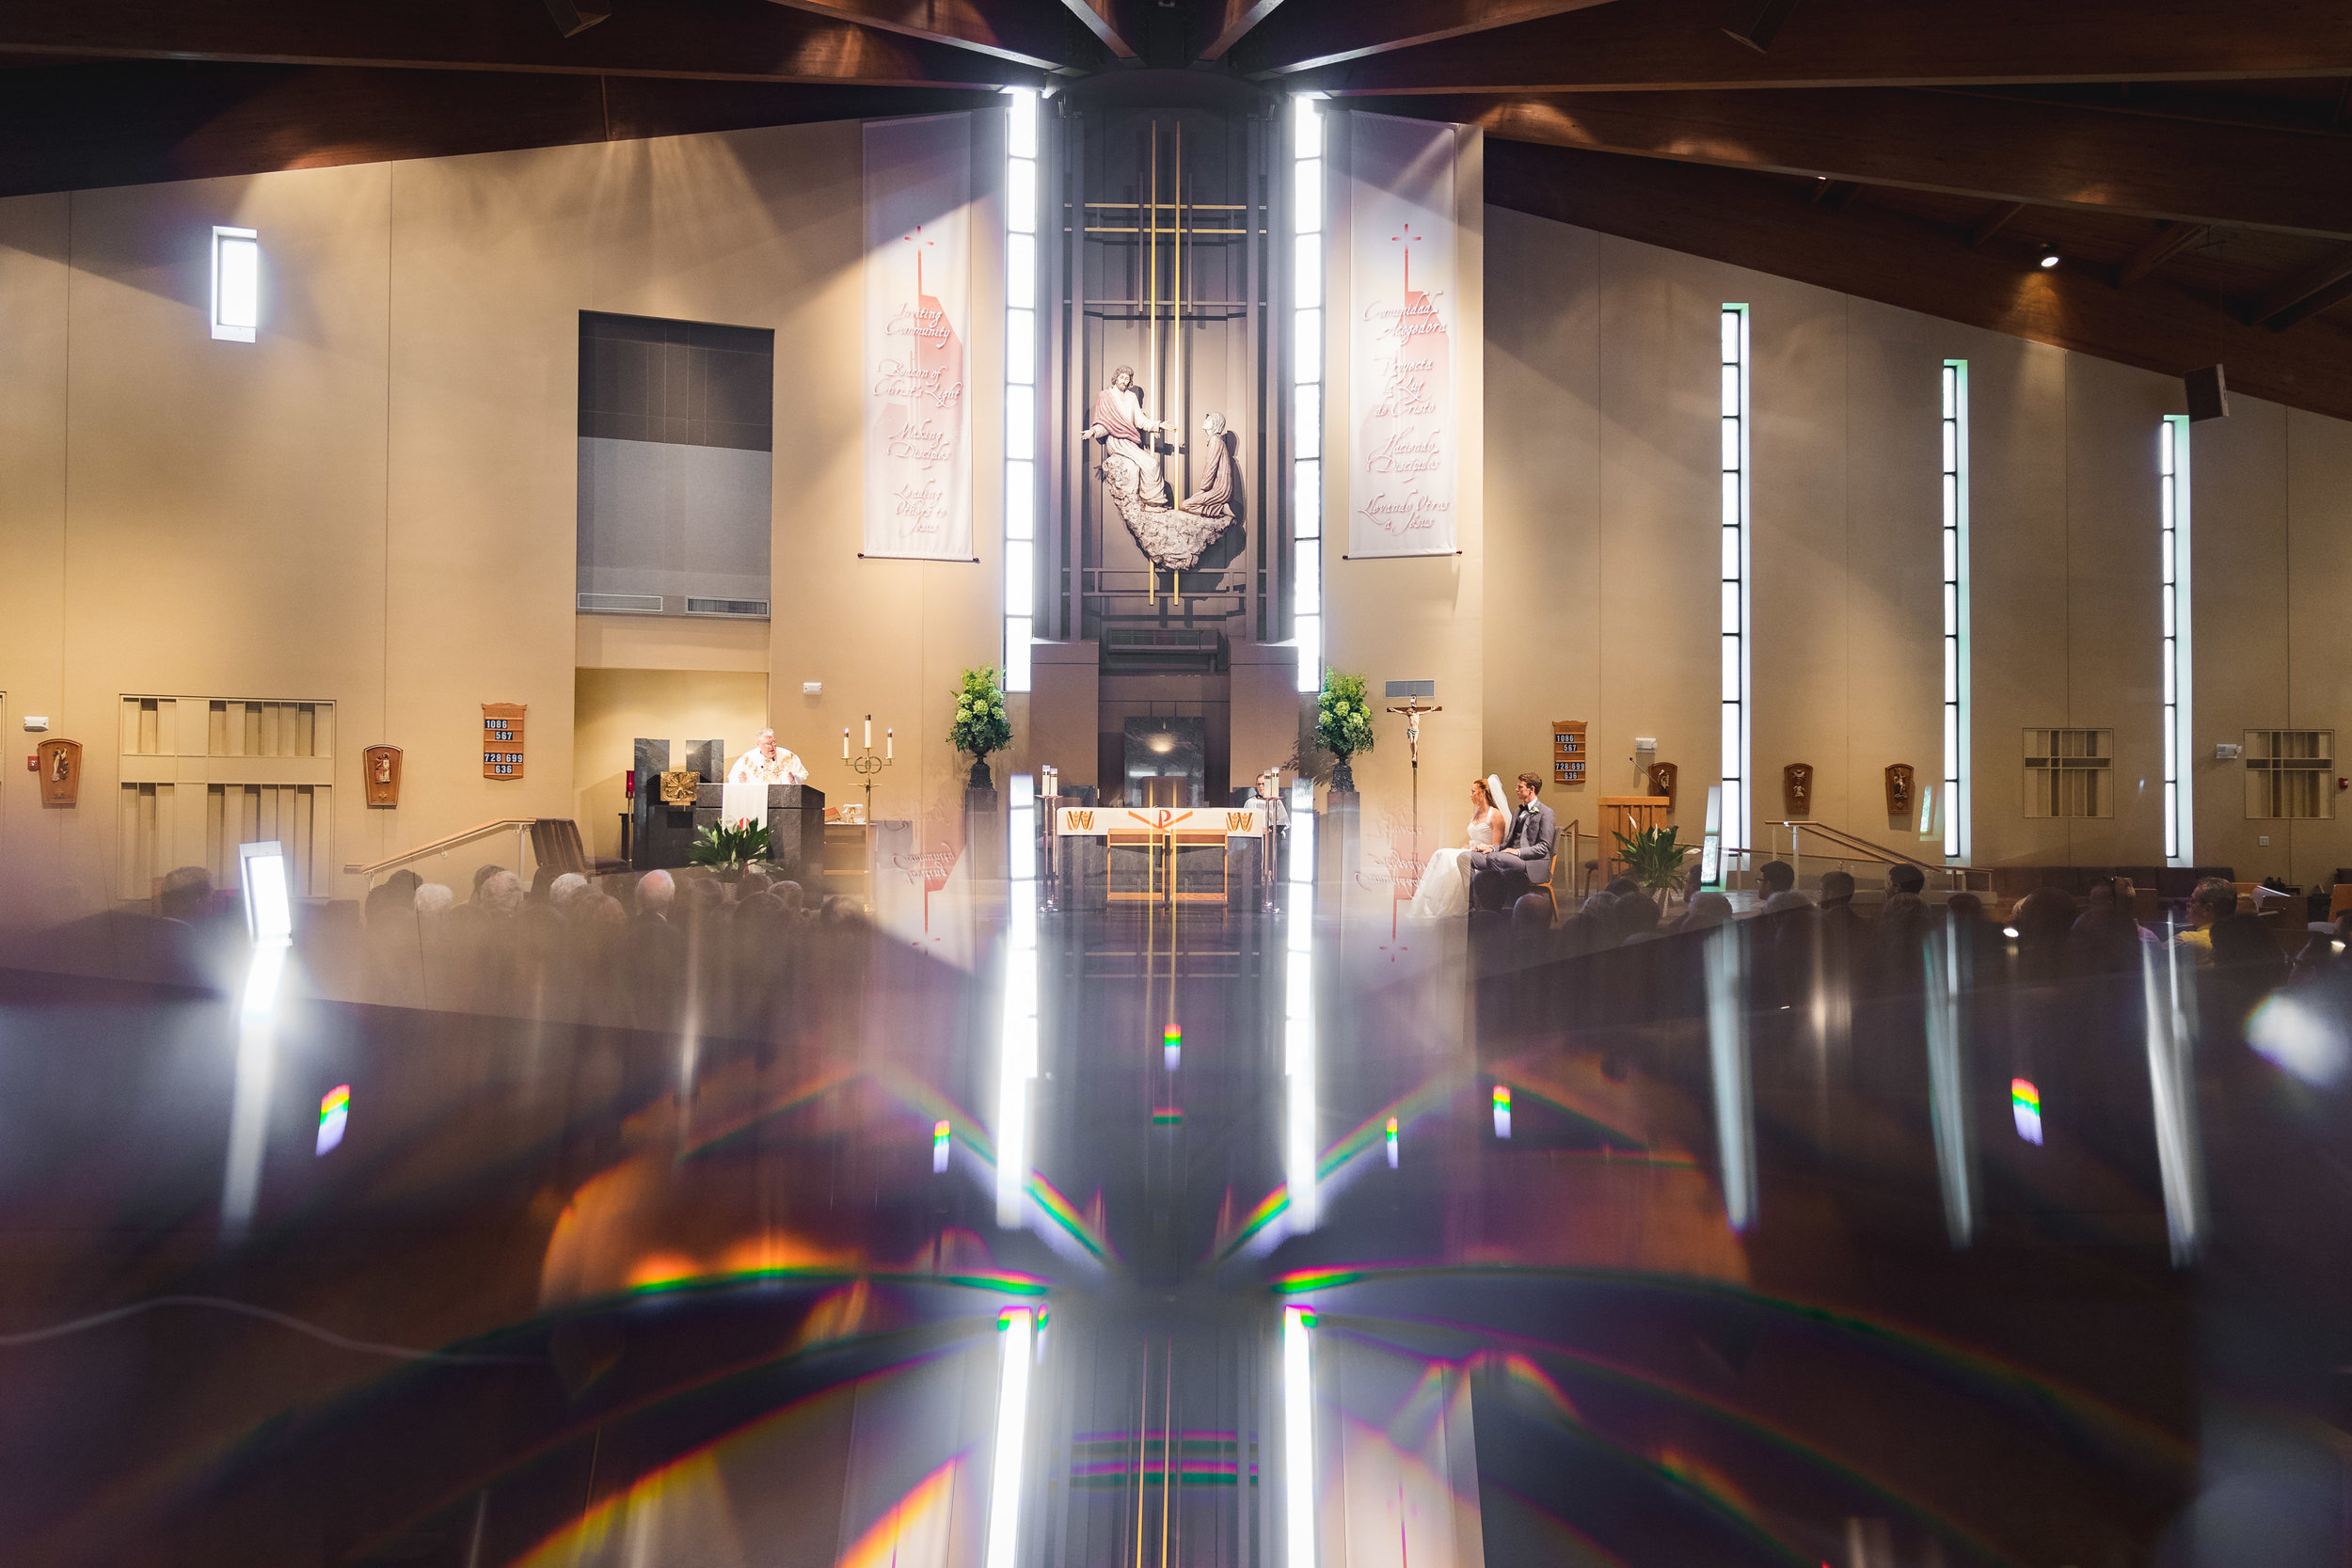 The beautiful church | St Mary Magdalene Catholic Church Simpsonville, SC